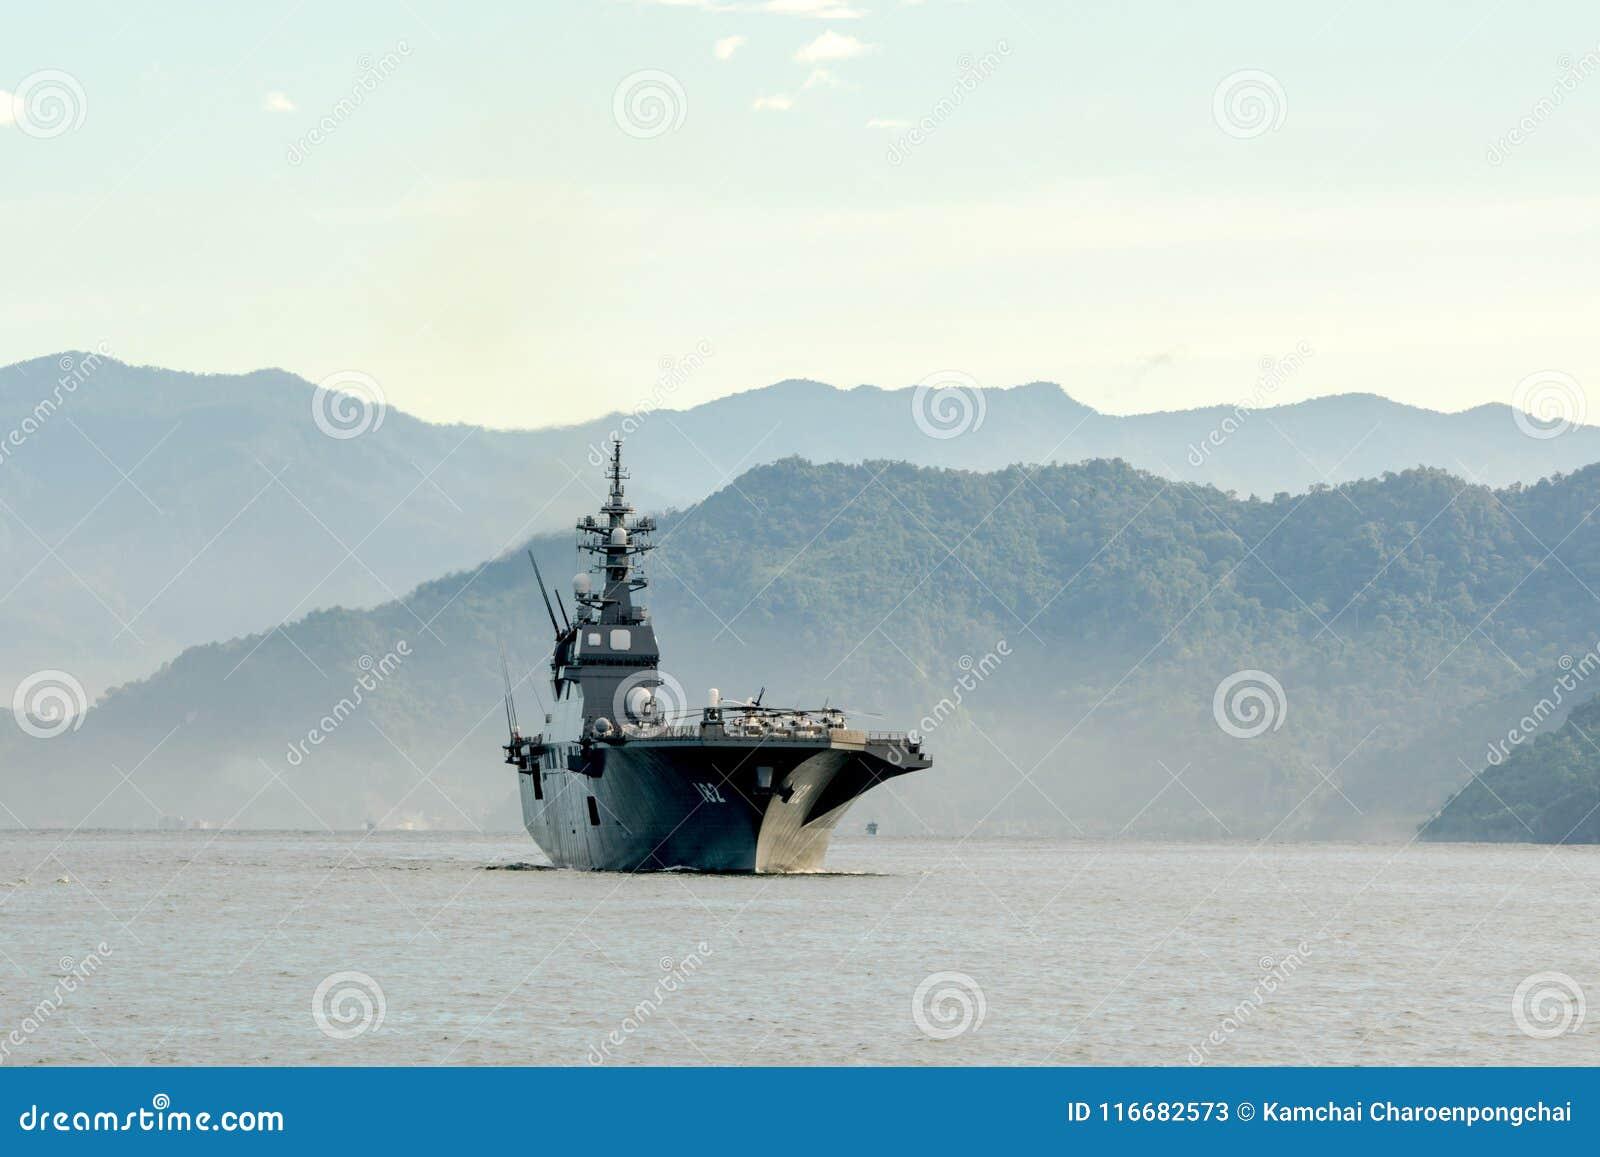 JS Ise, καταστροφέας ελικοπτέρων hyuga-κατηγορίας των θαλάσσιων πανιών Δύναμης Αυτοάμυνας της Ιαπωνίας στο λιμάνι Padang